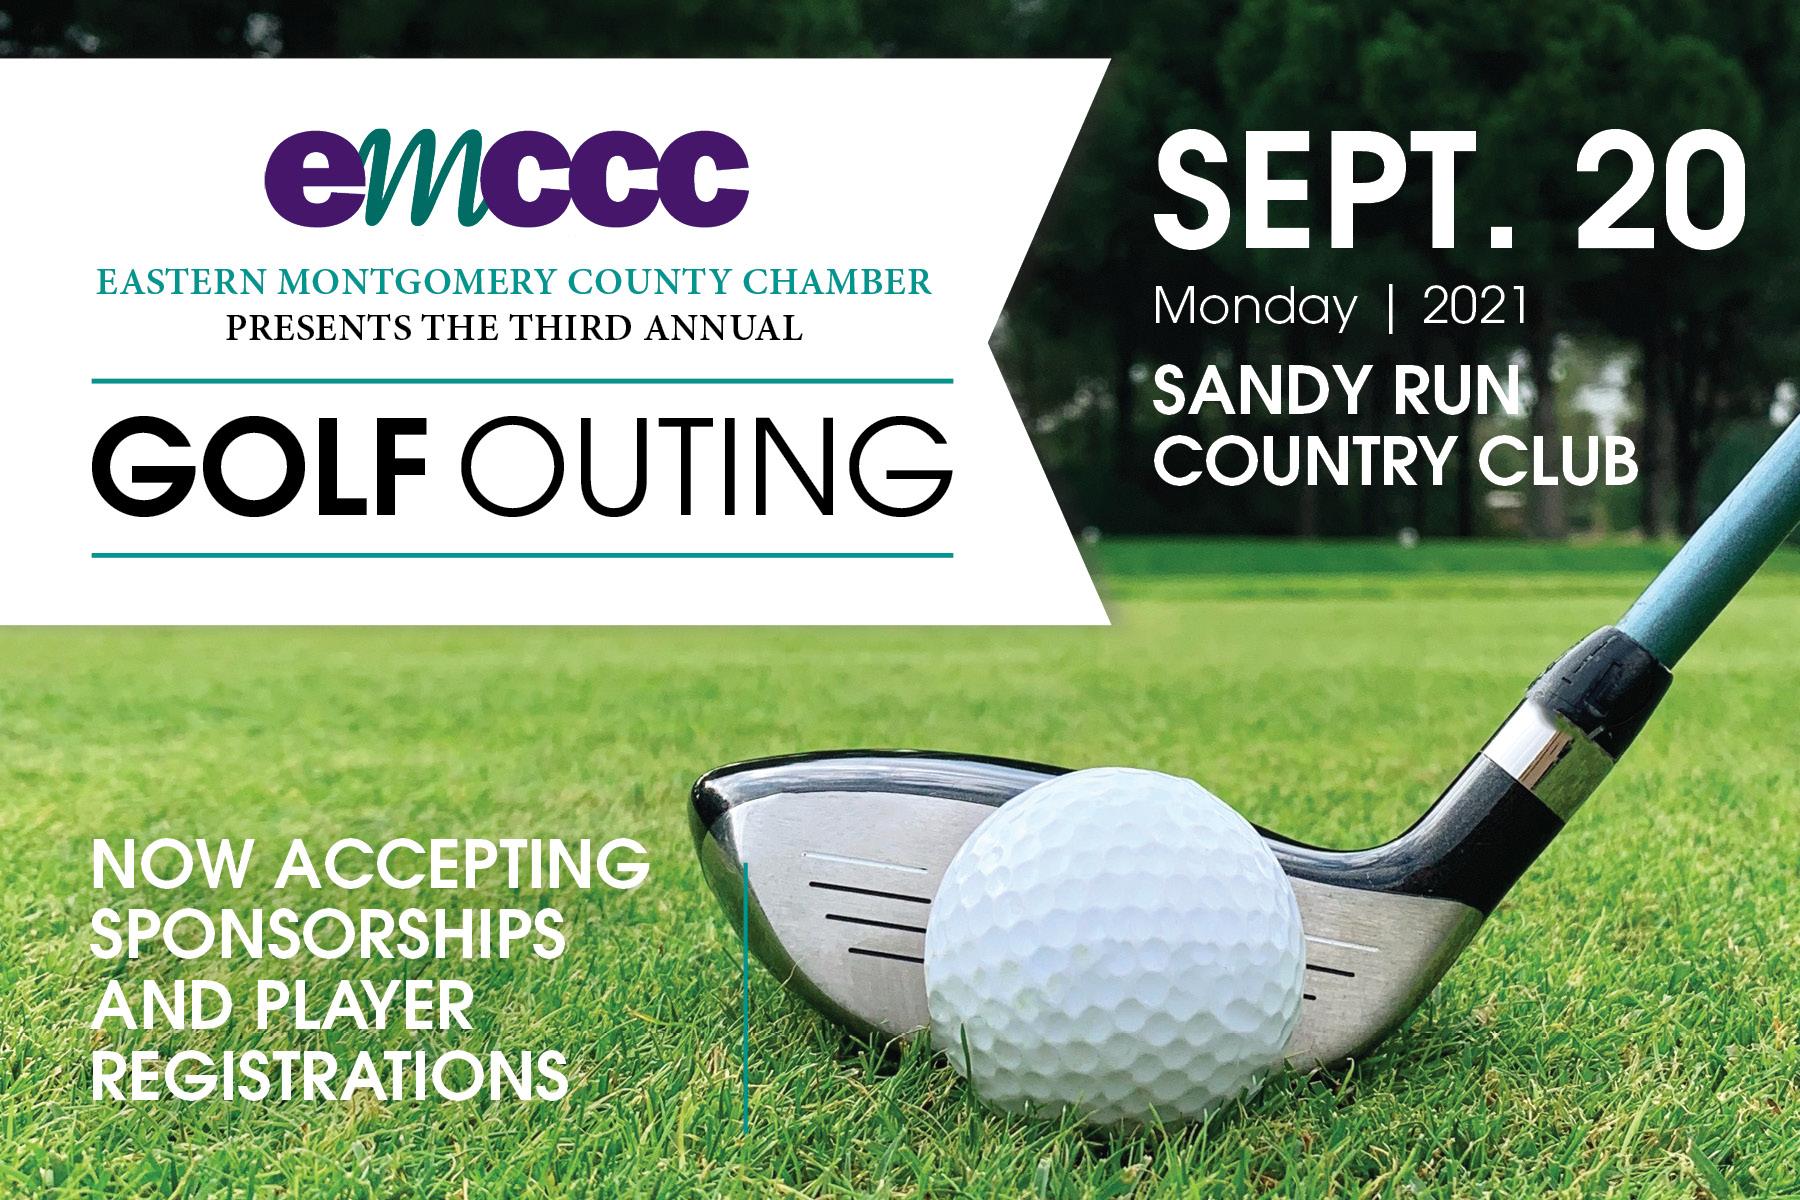 Golf outing register & sponsorships image 2021